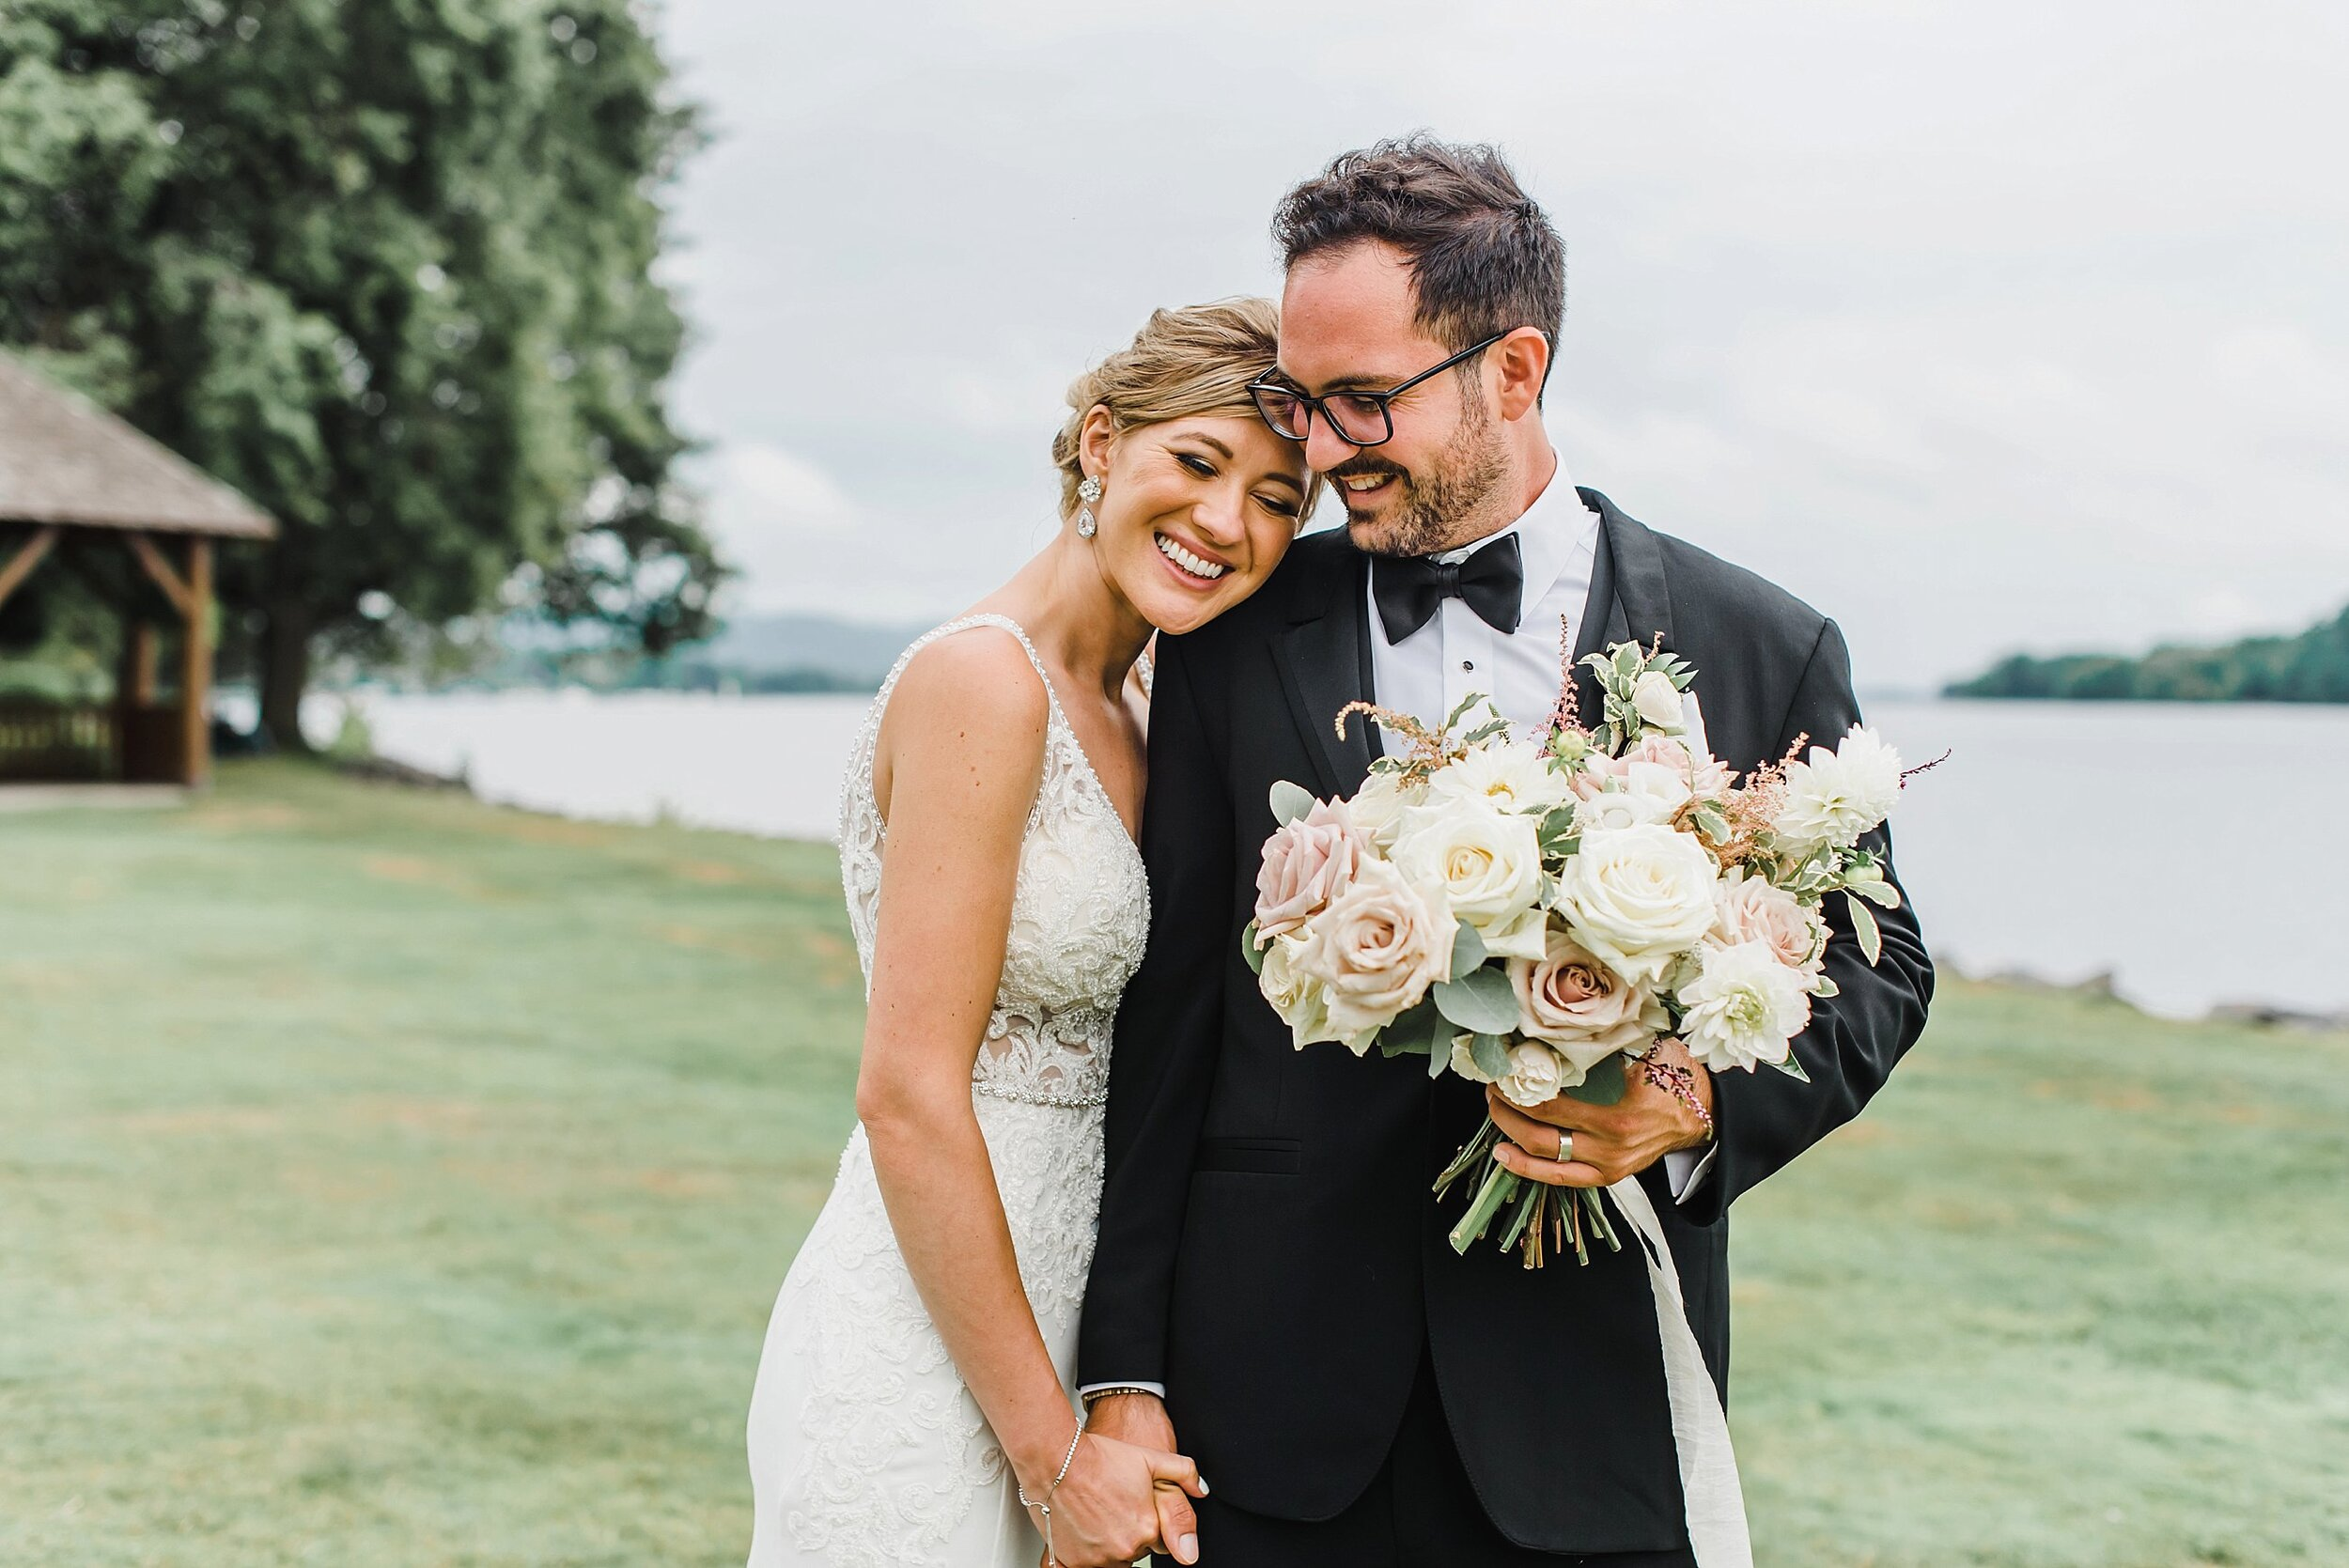 light airy fine art ottawa wedding photographer | Ali and Batoul Photography | Fairmont Le Chateau Montebello54.jpg